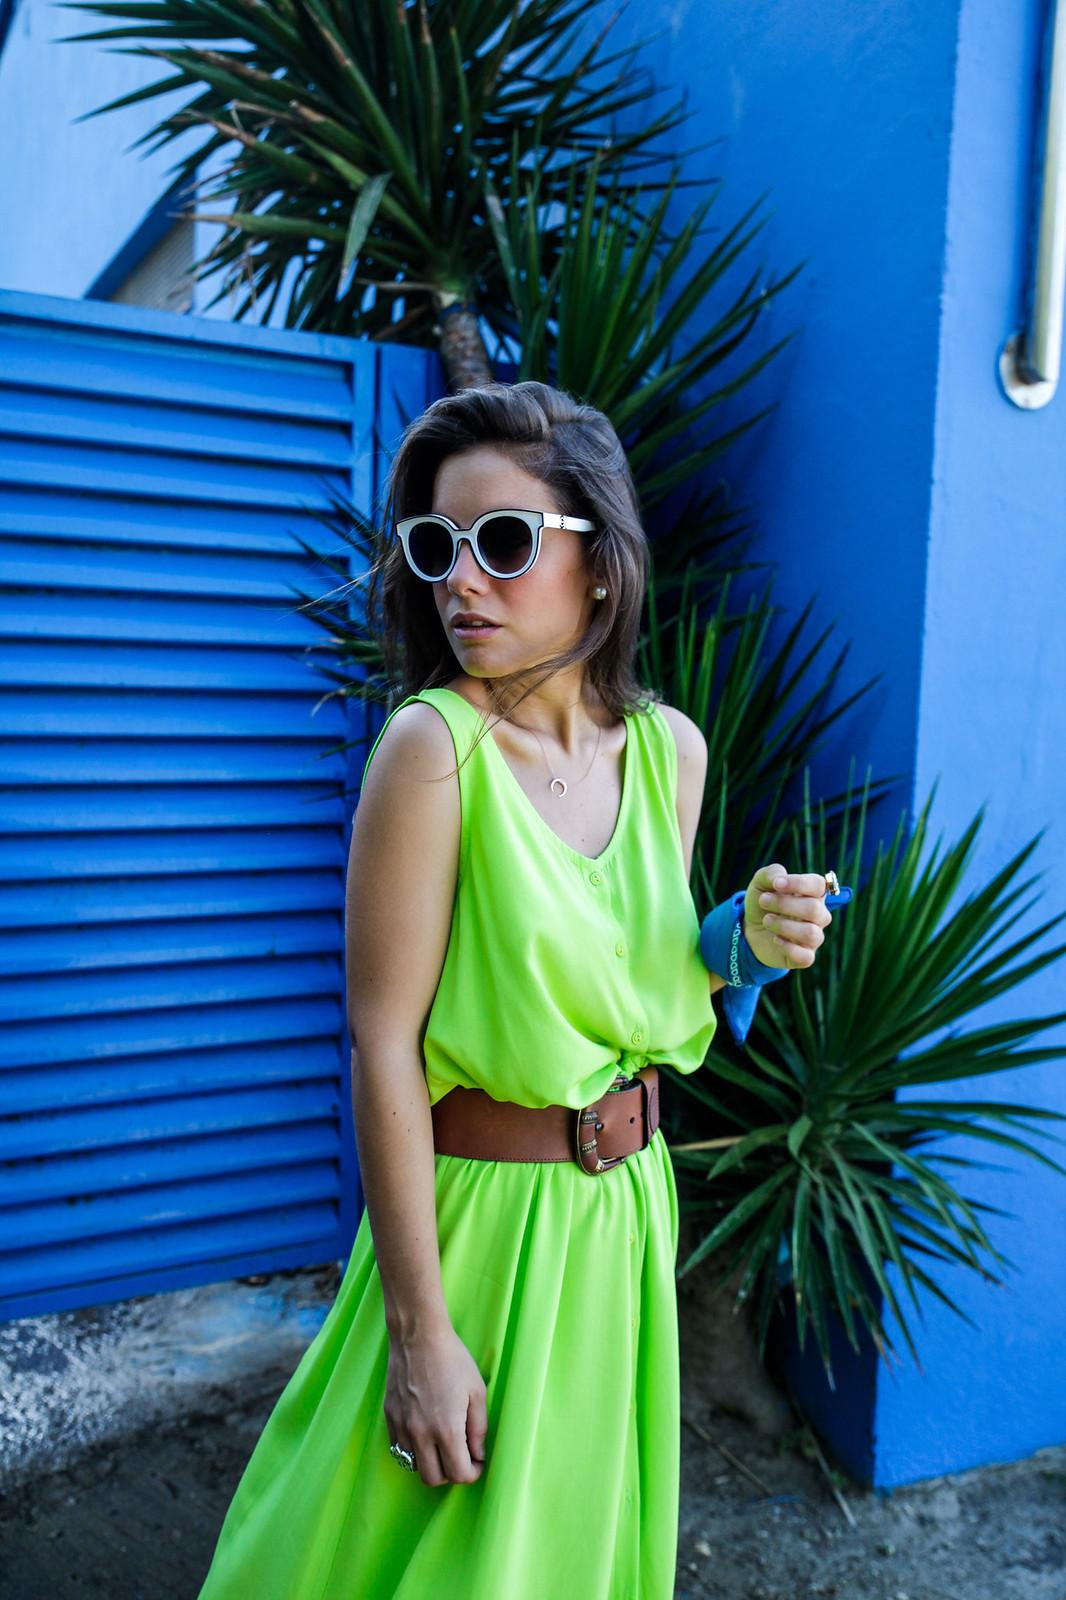 012_Vestido_largo_lima_paisley_RÜGA_Portugal_theguestgirl_influencer_barcelona_brand_ambassador